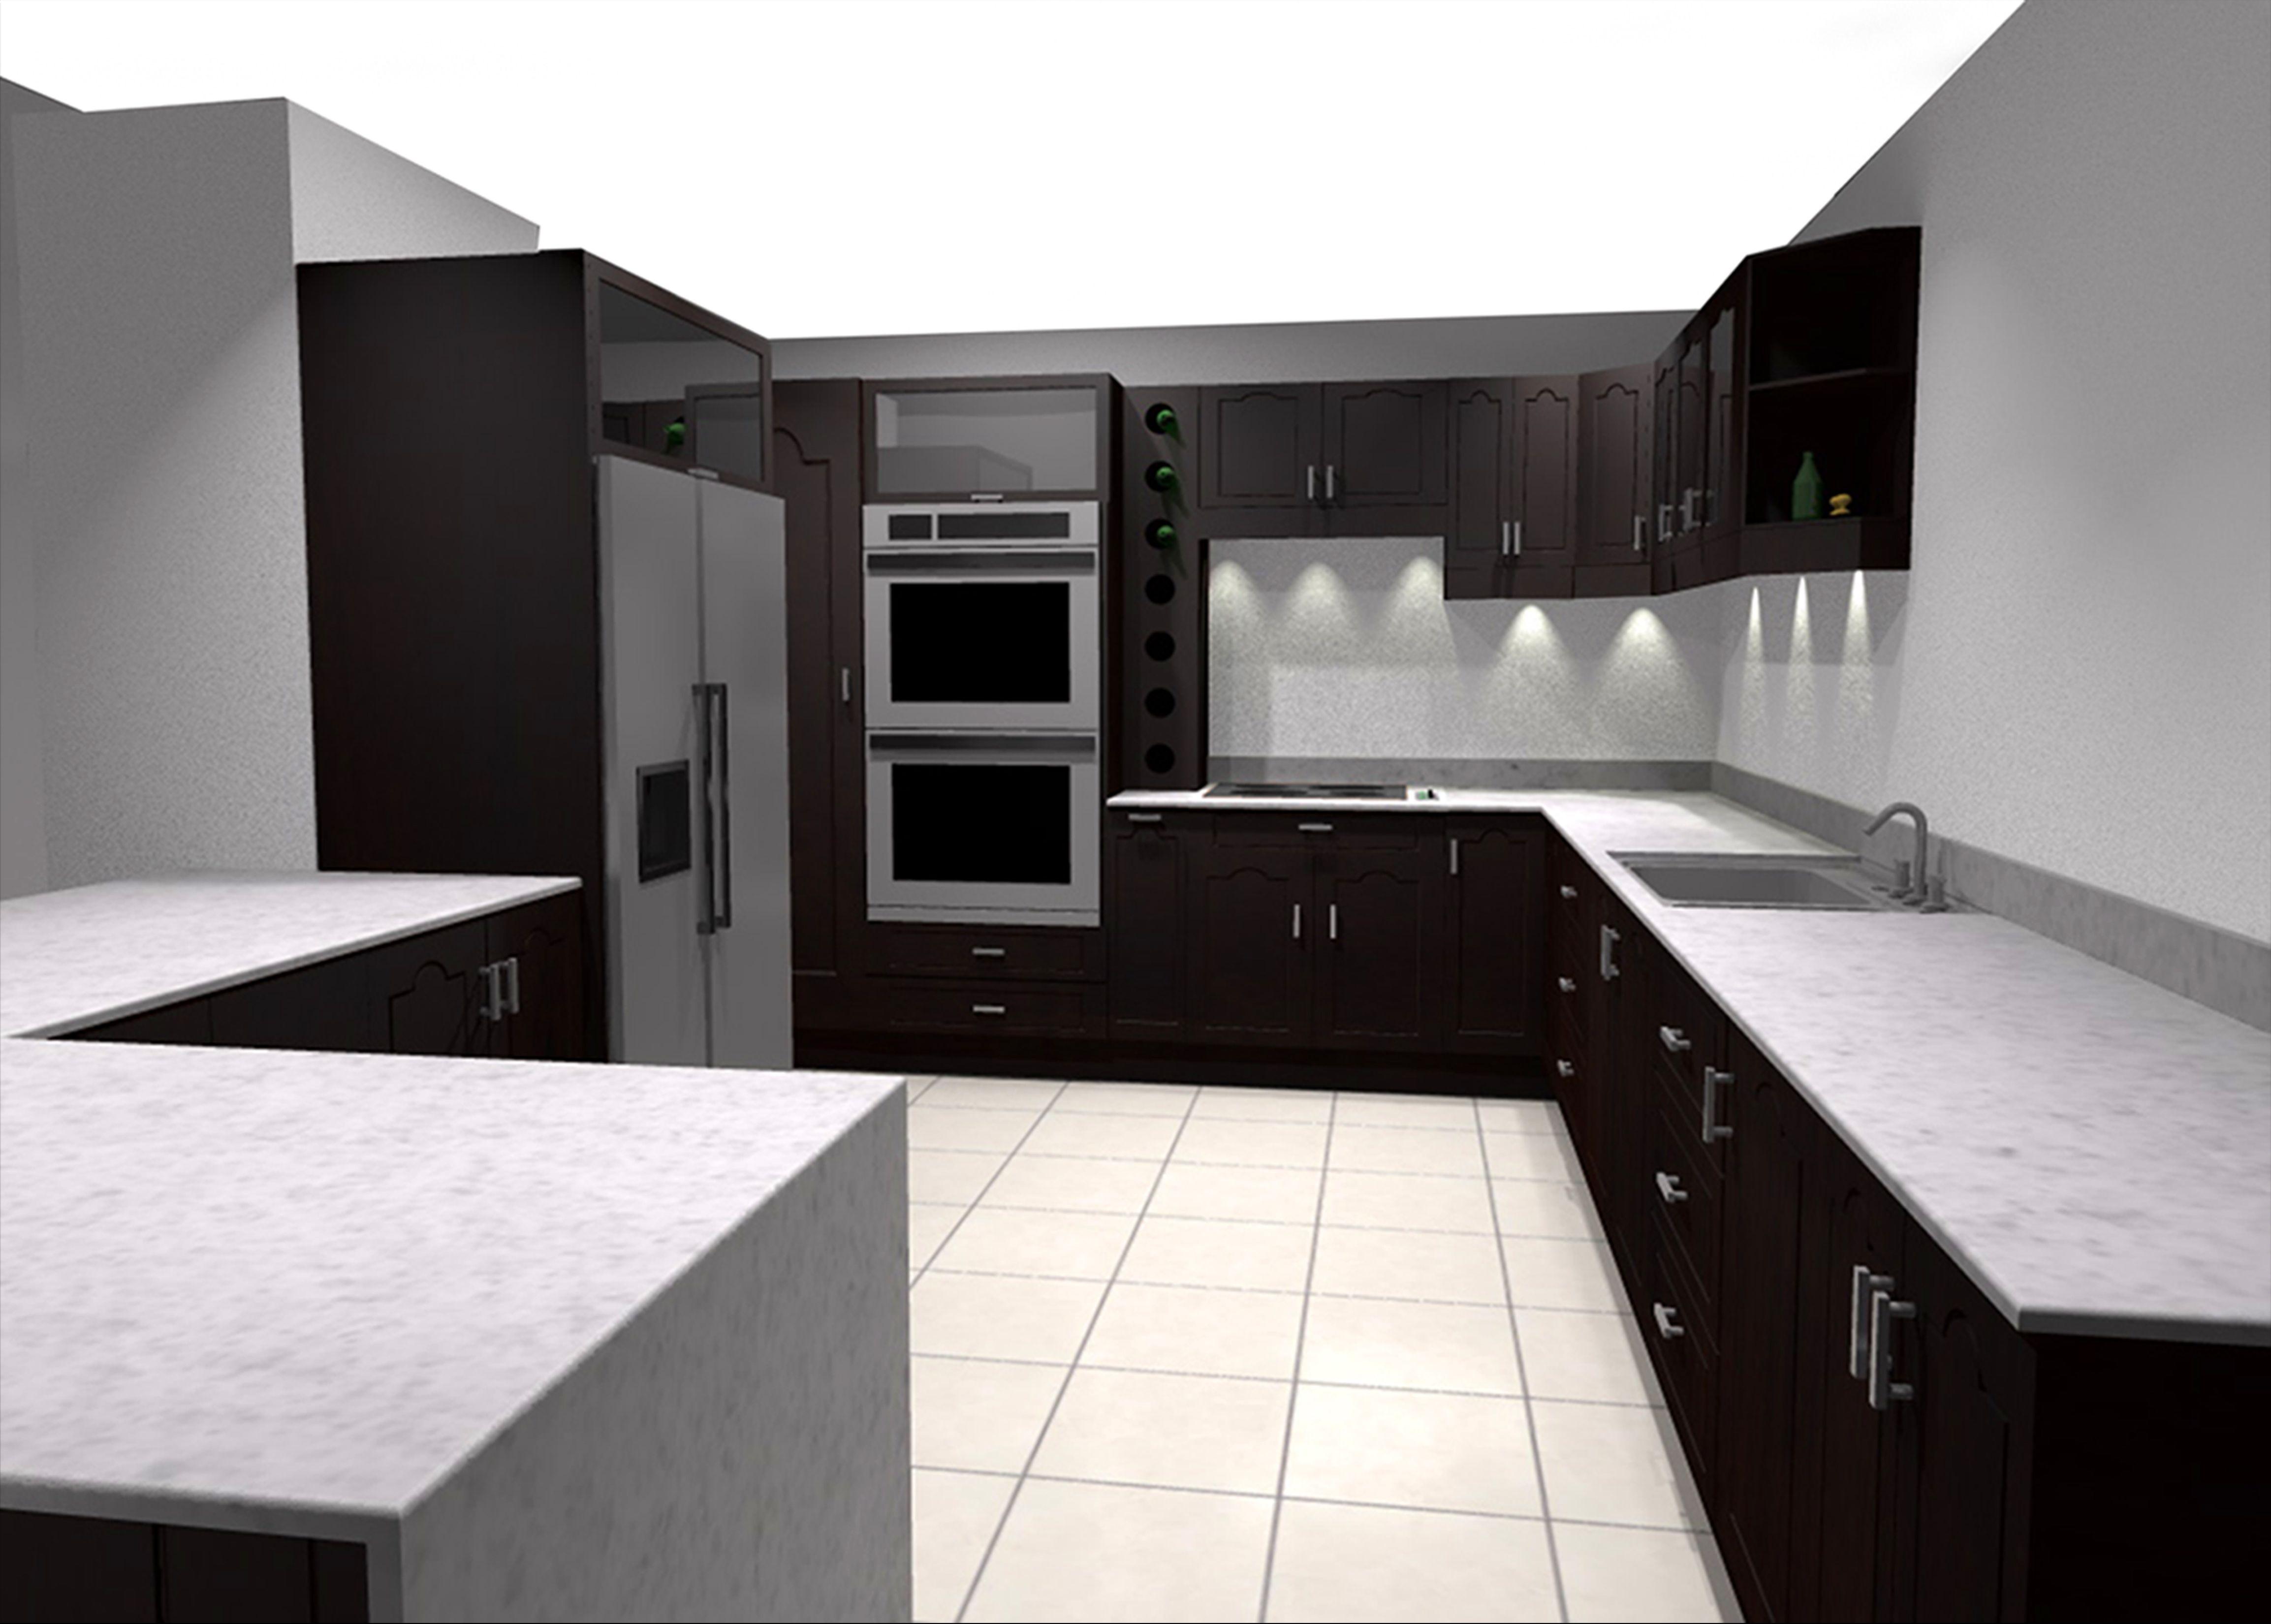 Mueble De Cocina Render Producci N Digital Siete Comunicaci N  # Muebles Digitales